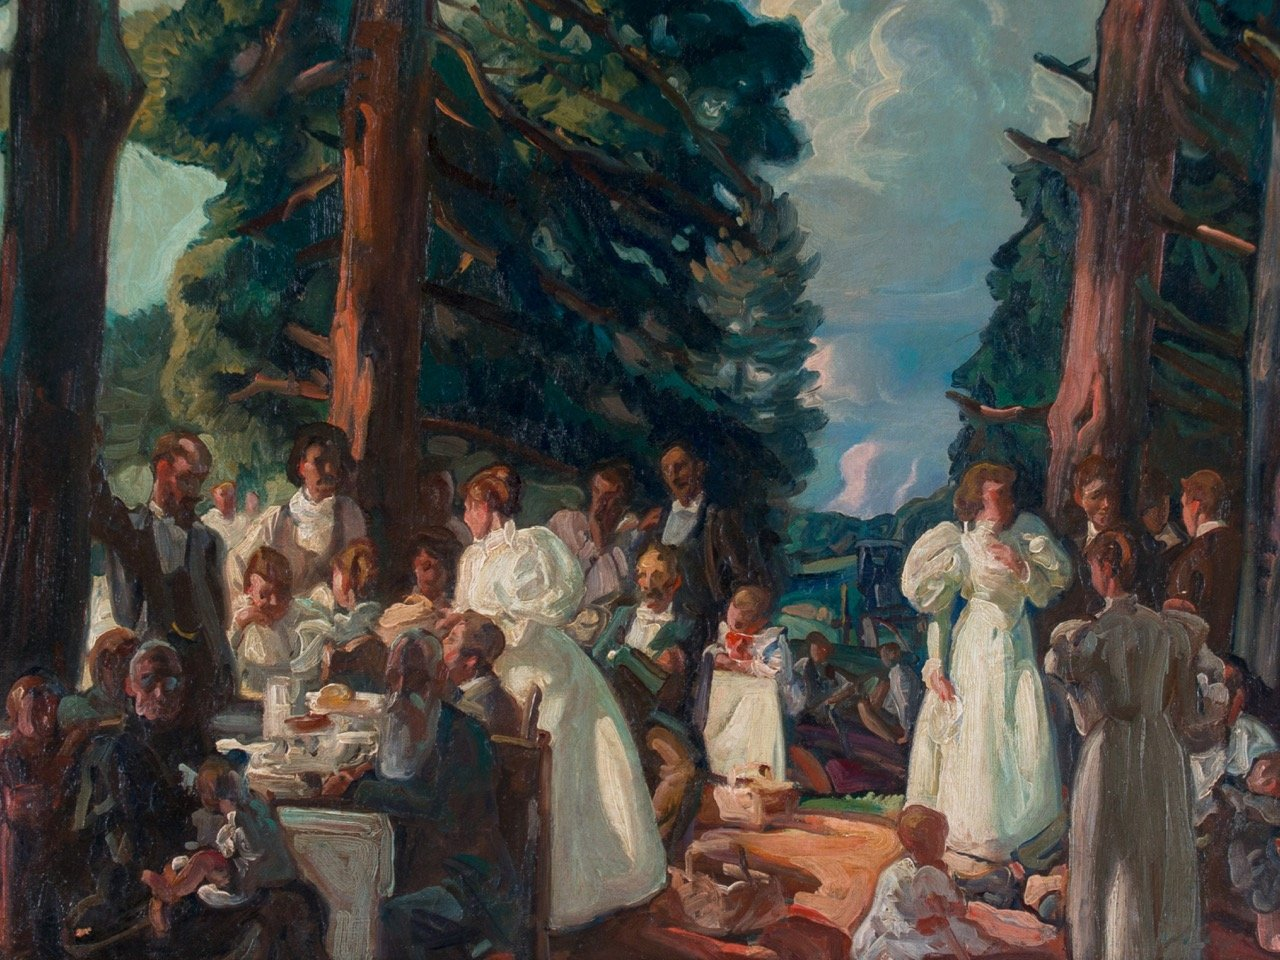 The Reunion, Brecksville, Ohio by Frank Nelson Wilcox